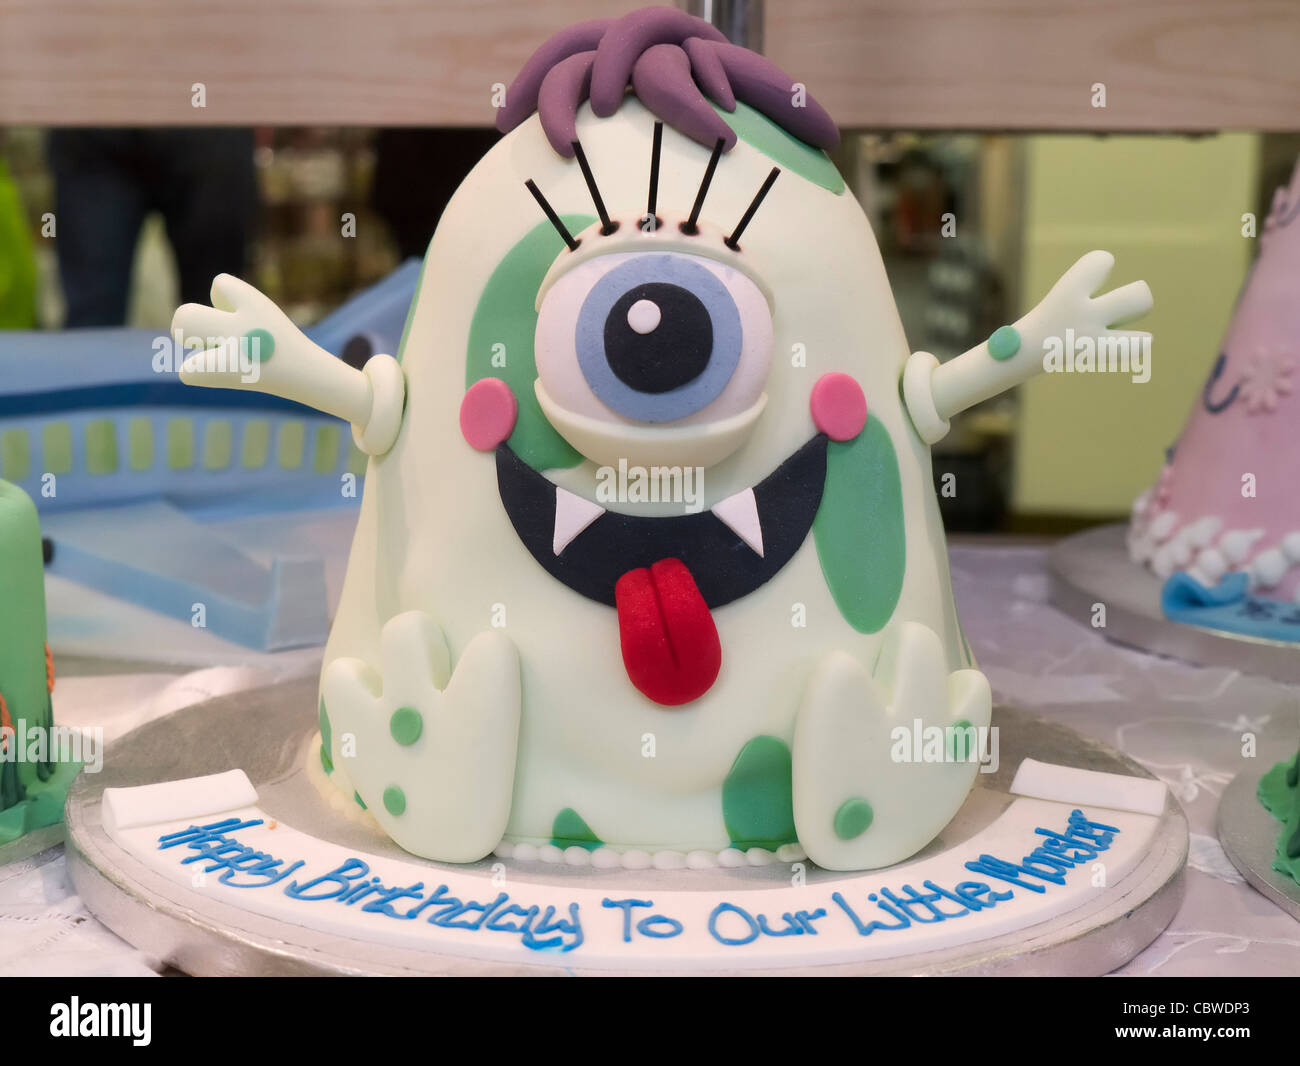 Amazing Imaginative Little Monster Birthday Cake Oxford Covered Market Funny Birthday Cards Online Inifofree Goldxyz